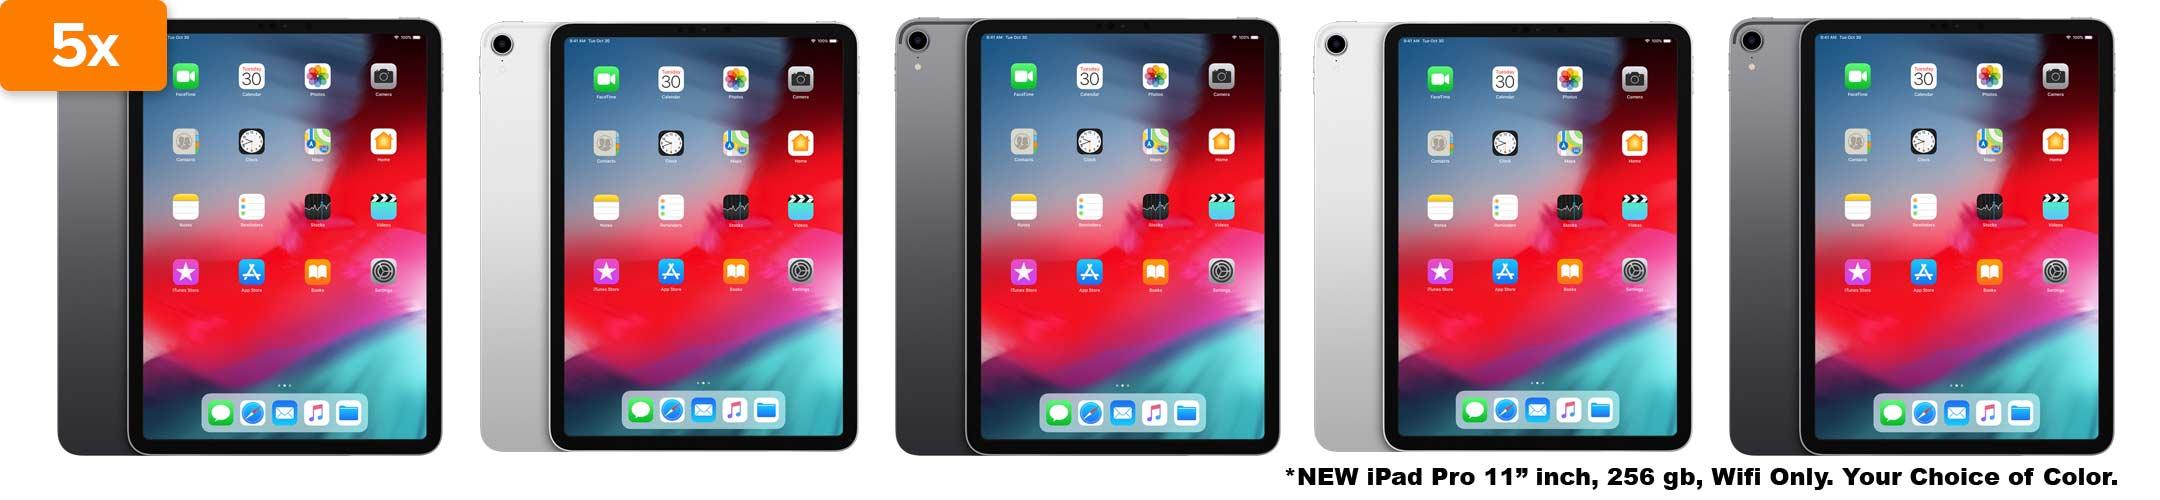 iPad Pro's